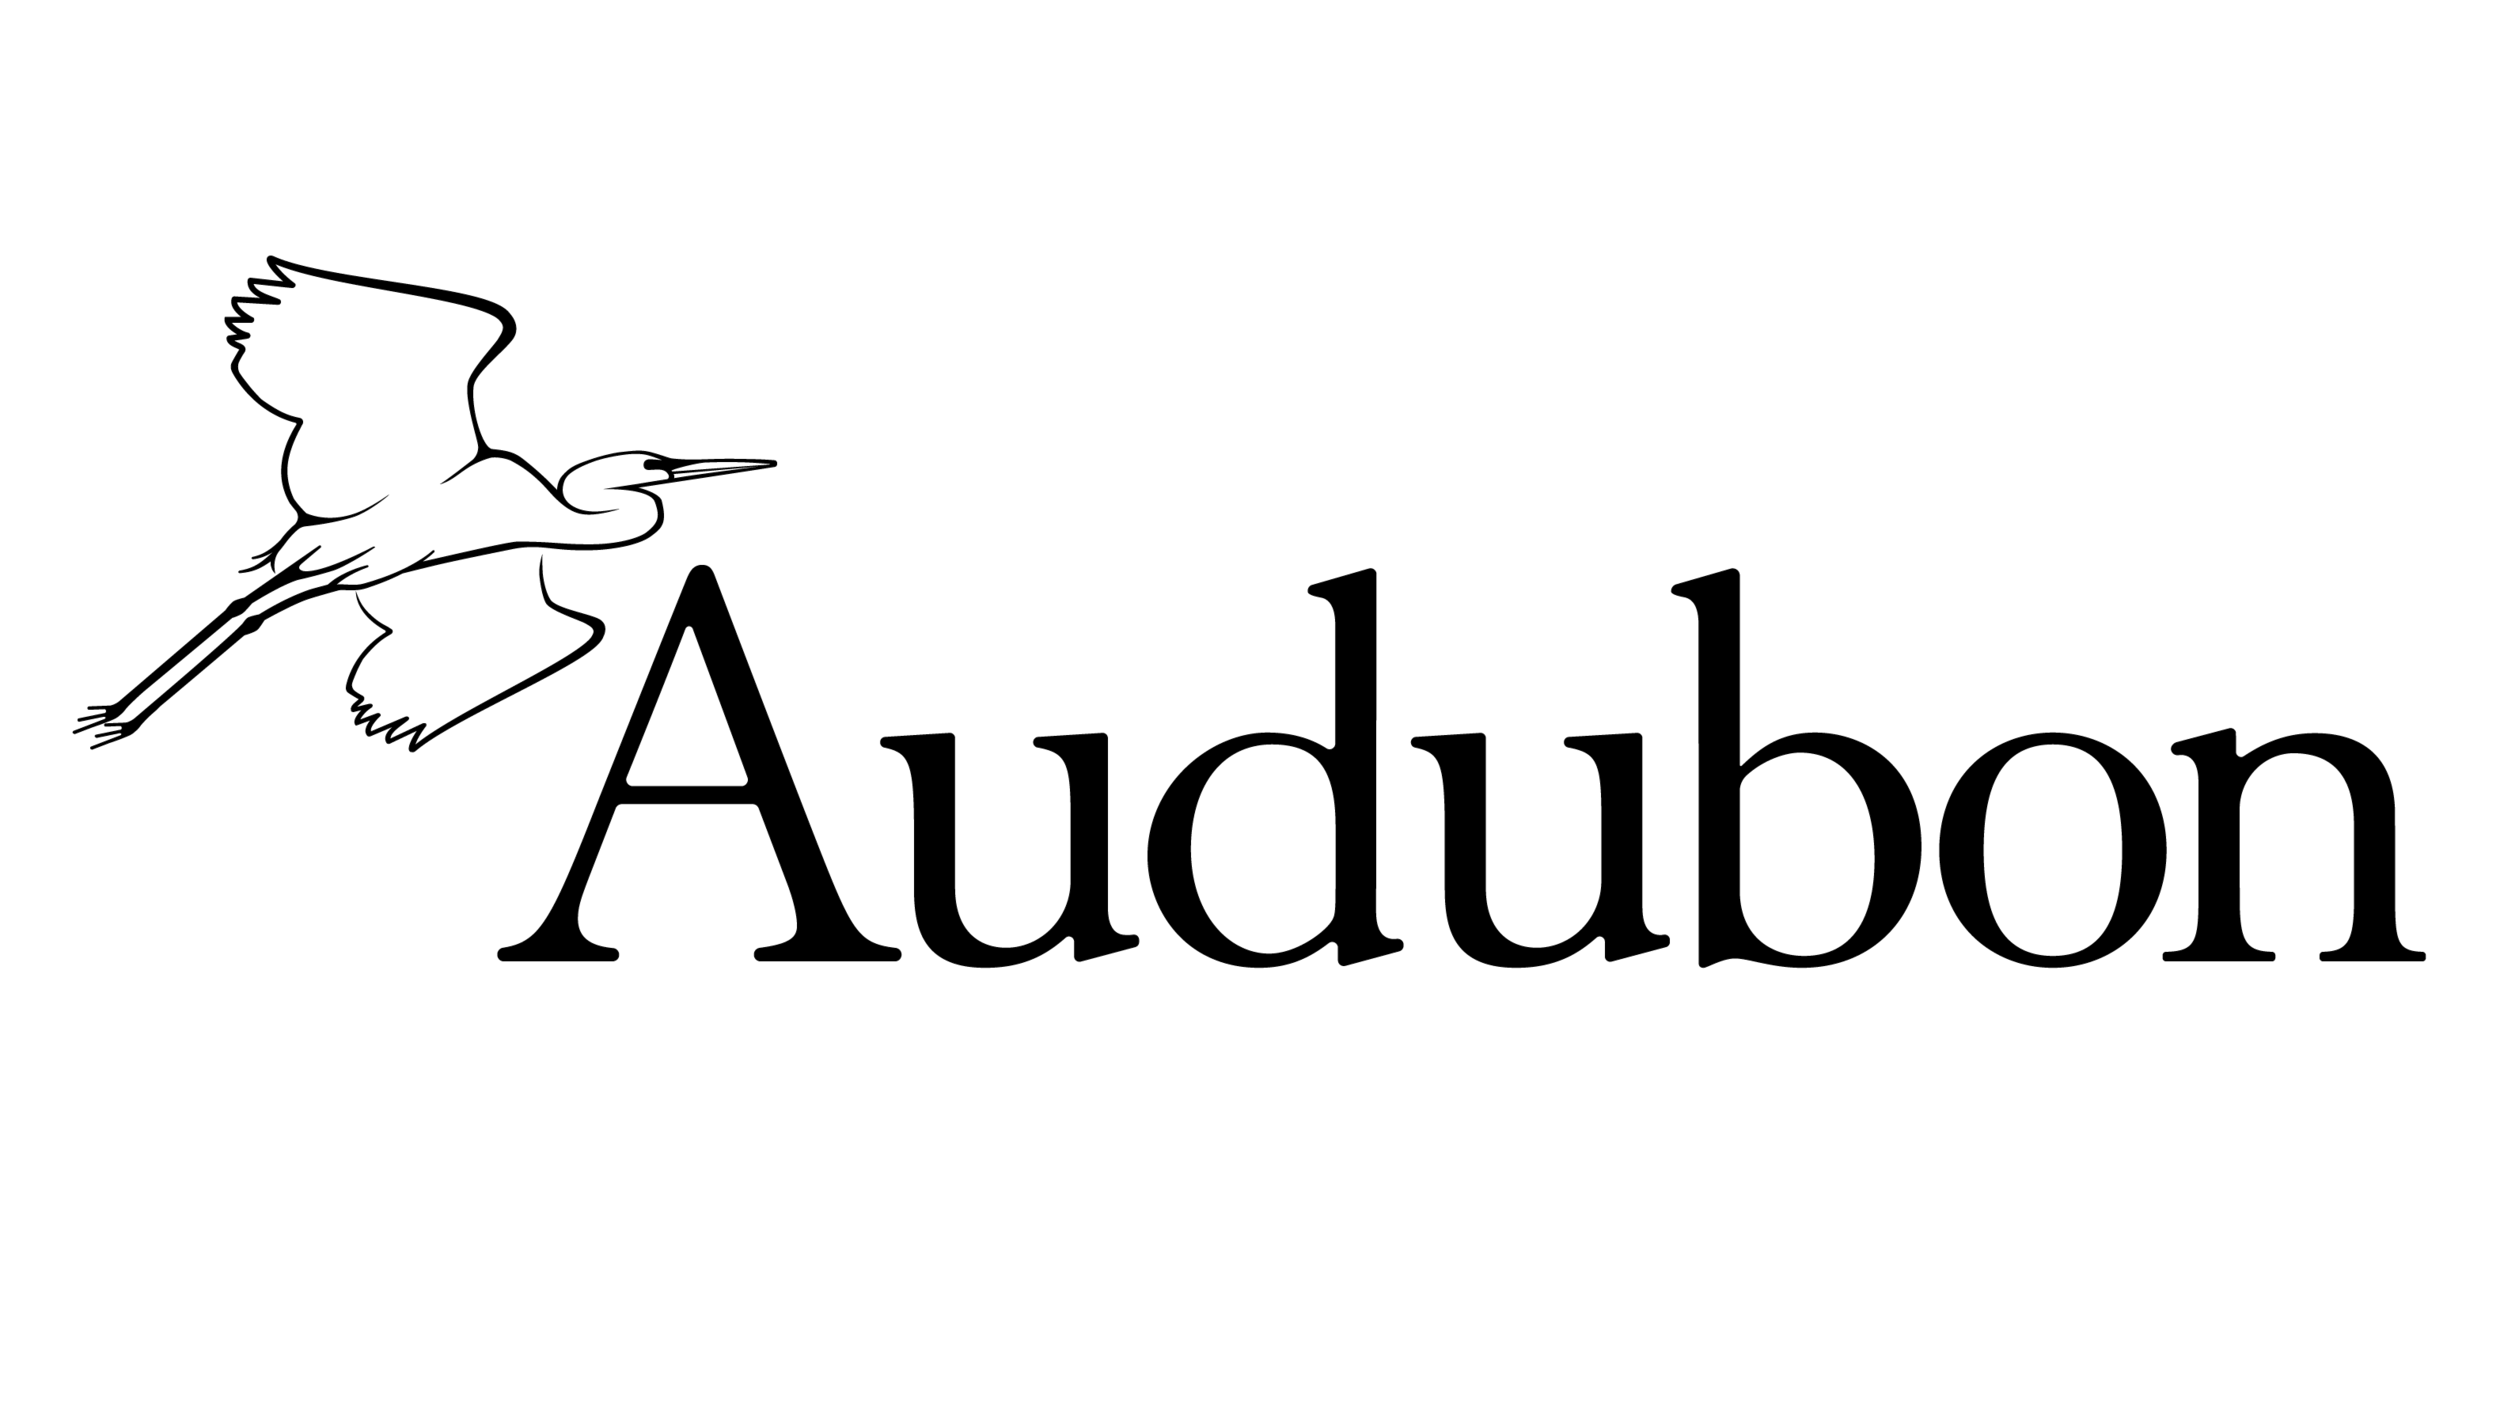 Audubon_Logo_BLK-resized.png